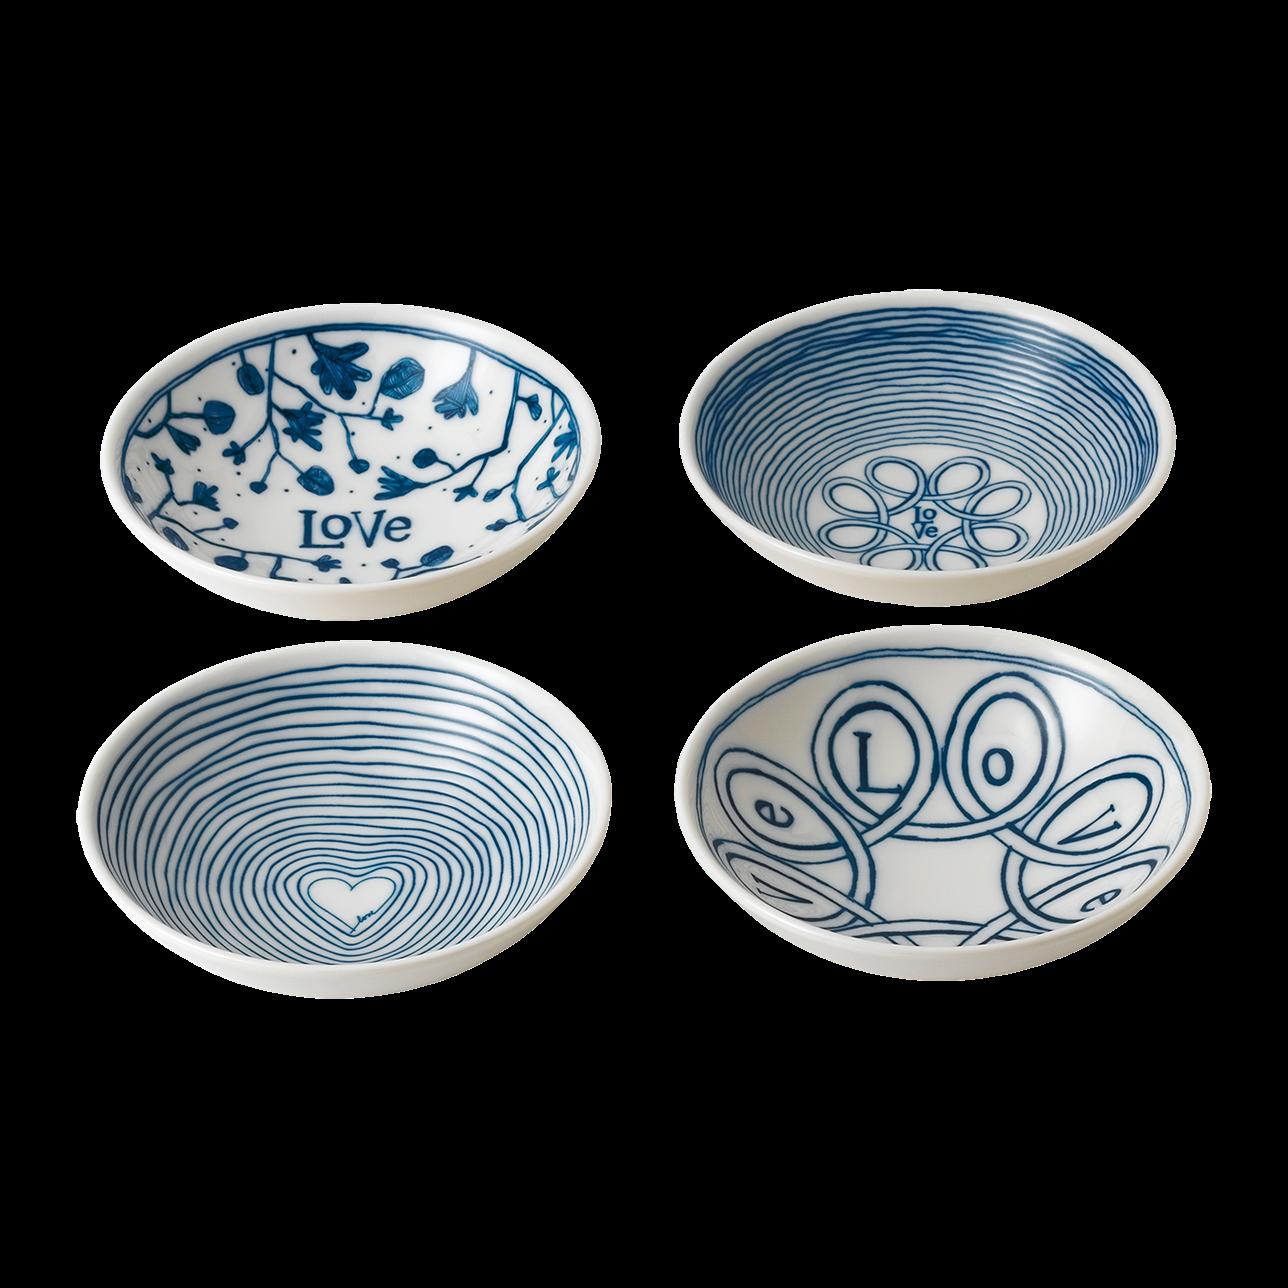 ED Blue Love Small Bowls (Set of 4)